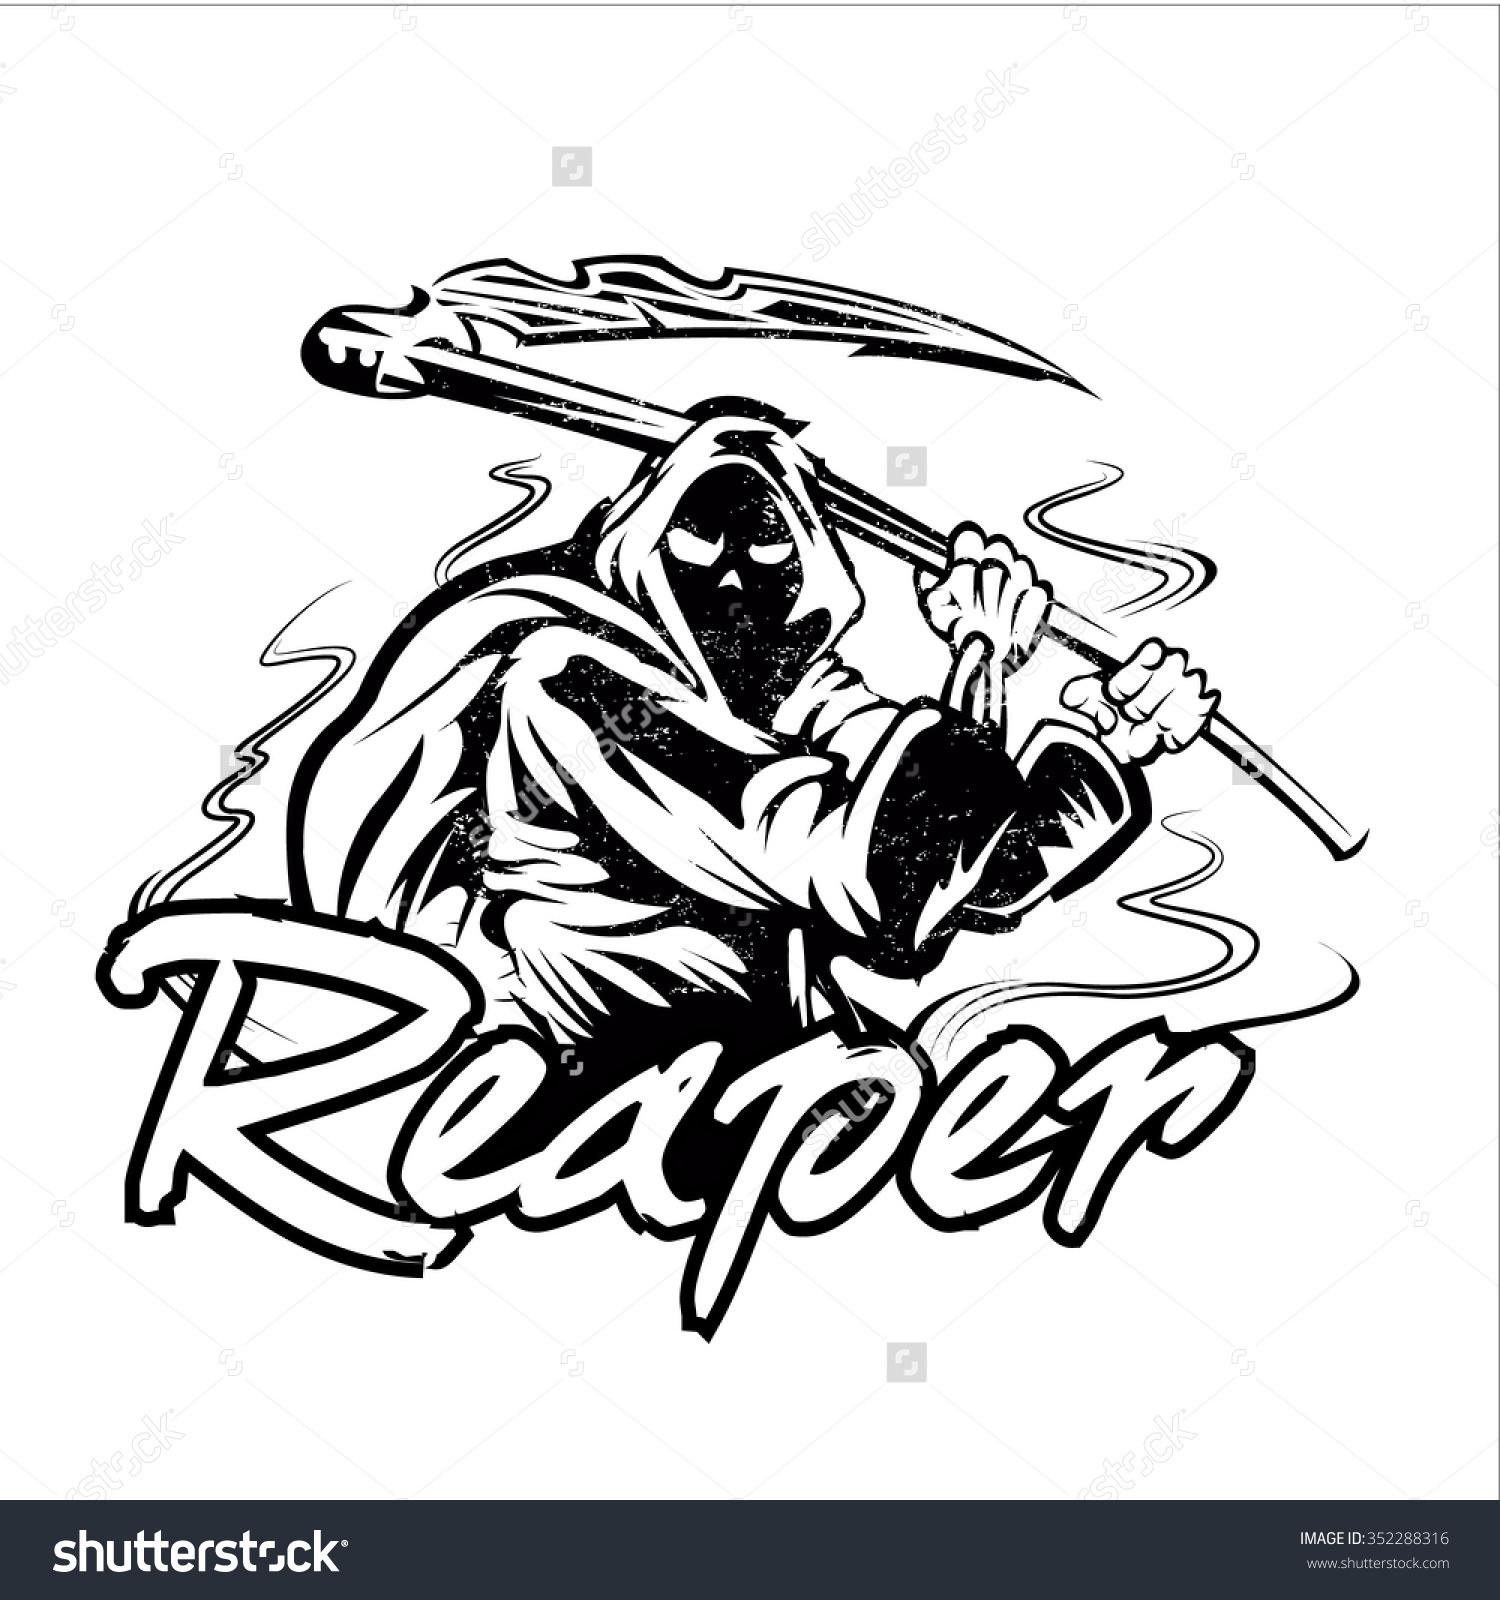 Hand Inked Grim Reaper Illustration Stock Vector 352288316.